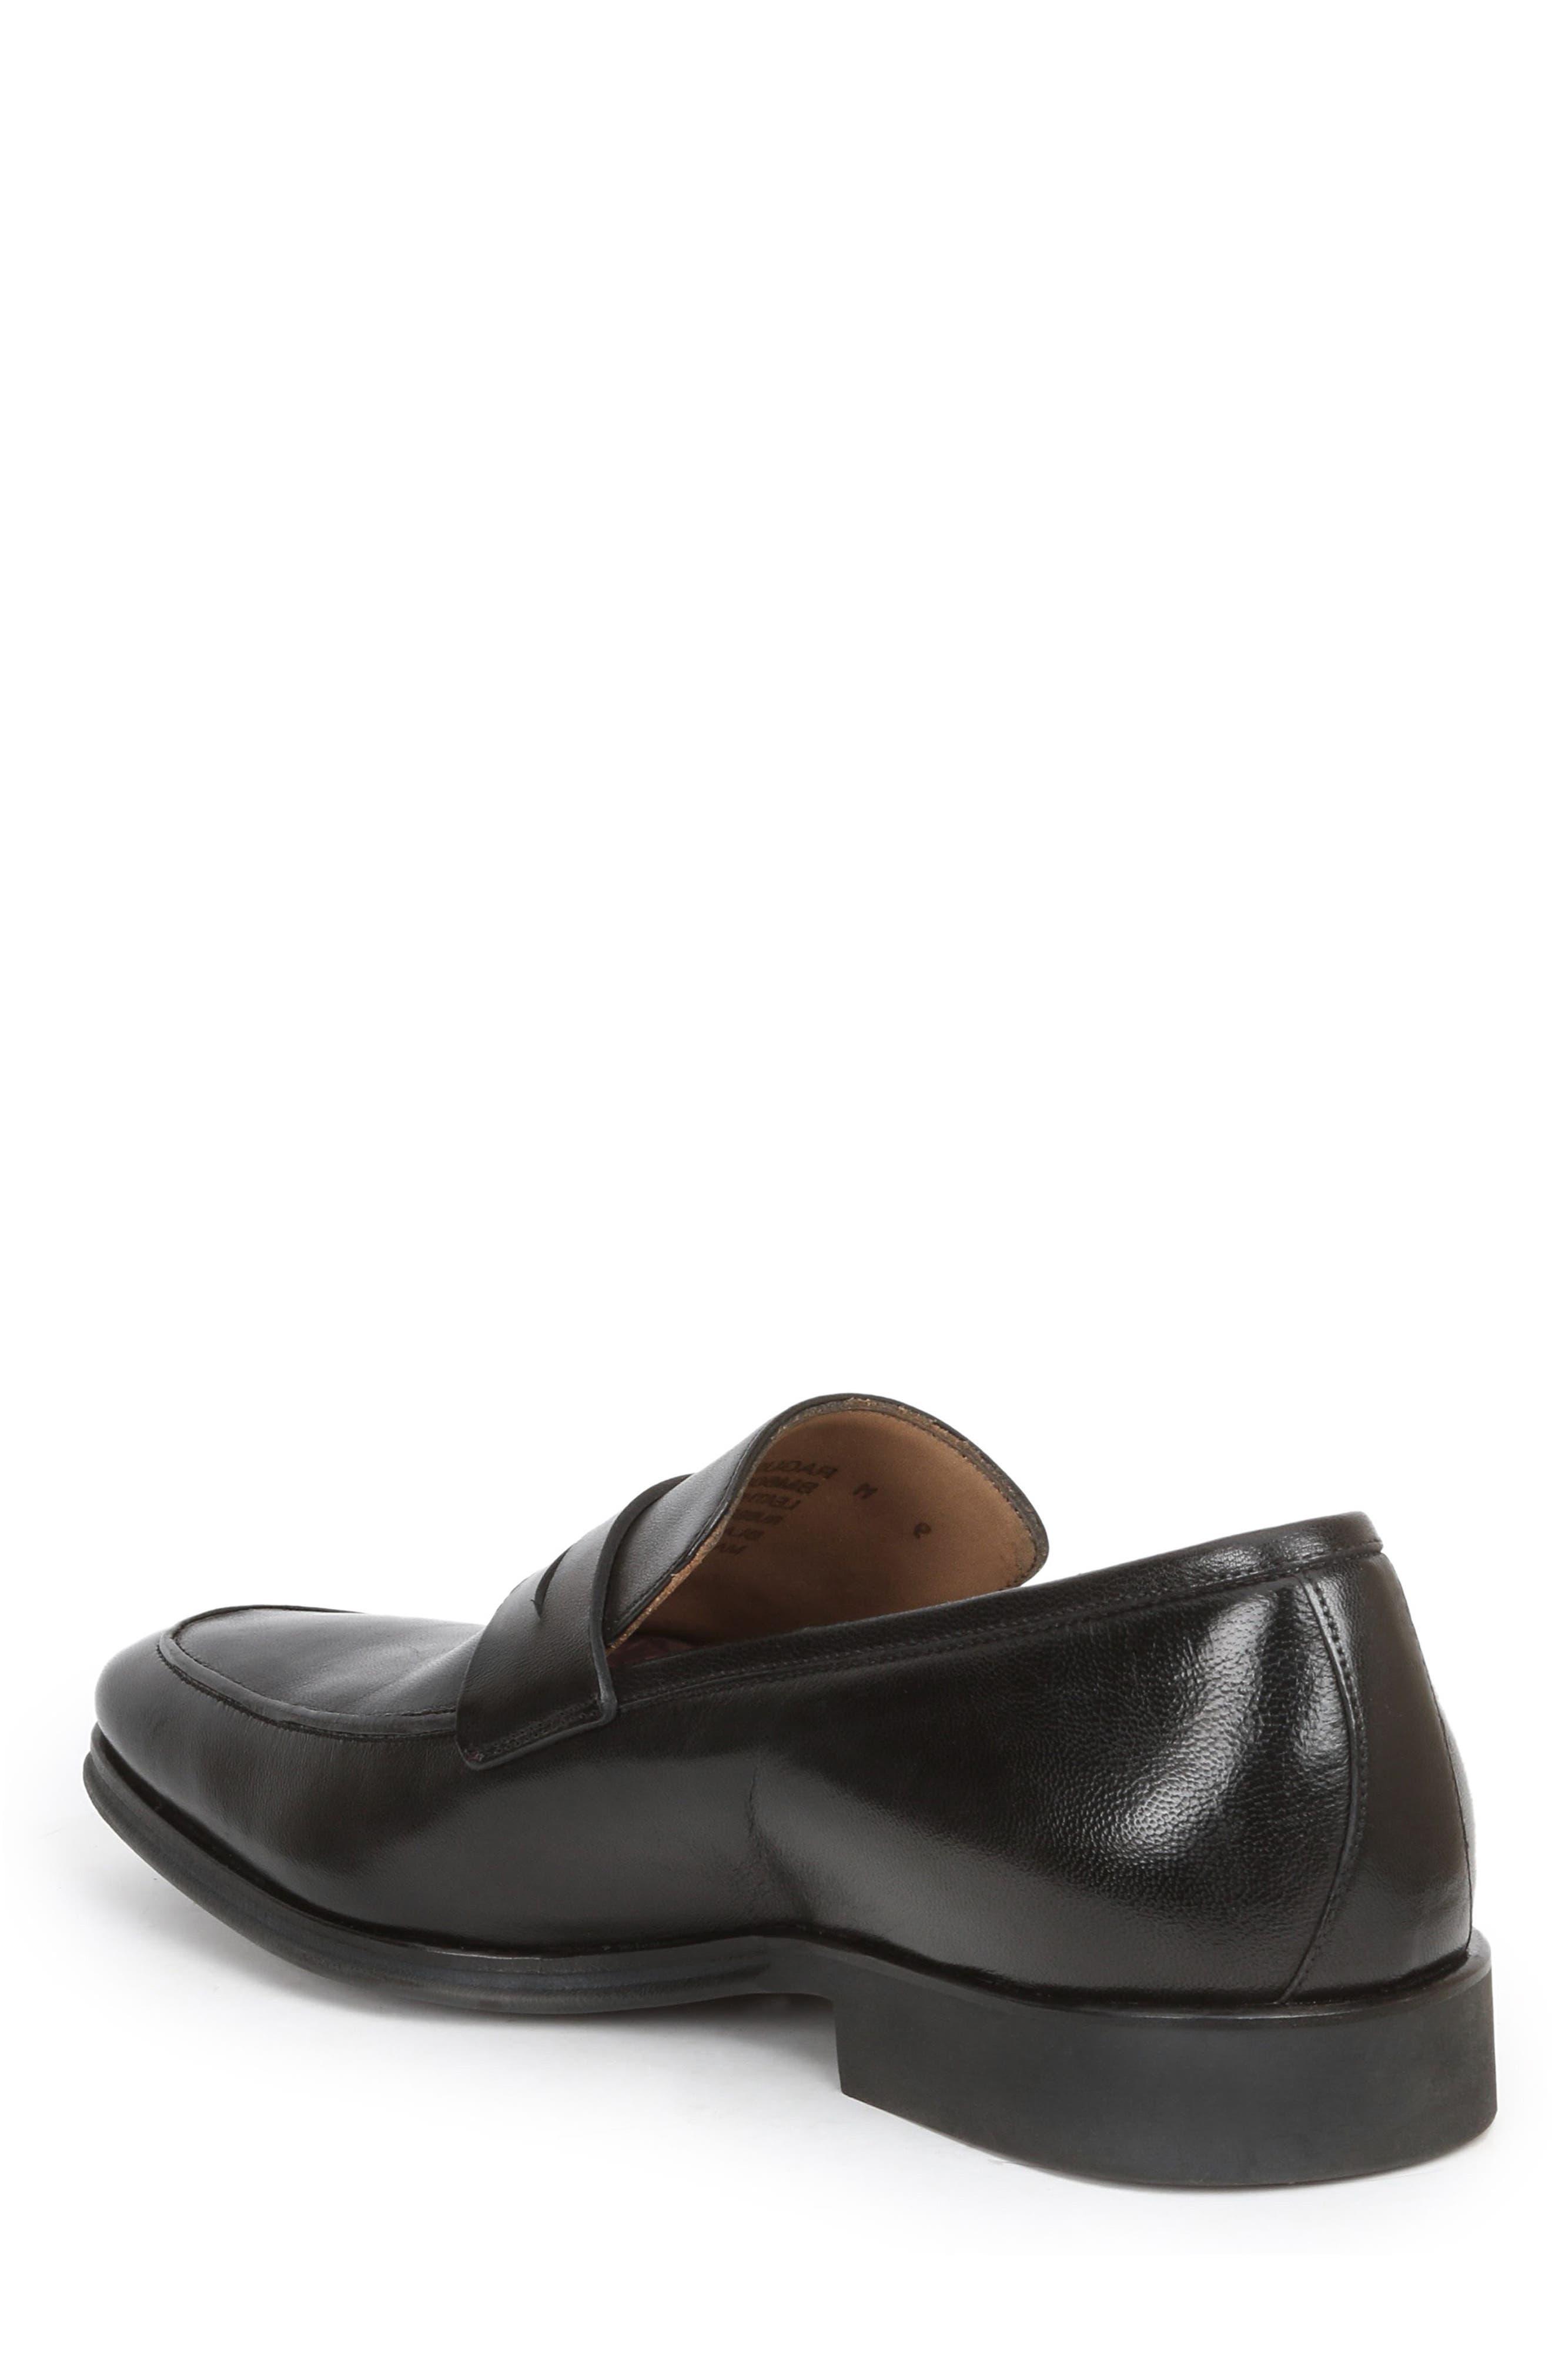 Ragusa Penny Loafer,                             Alternate thumbnail 2, color,                             Black Leather